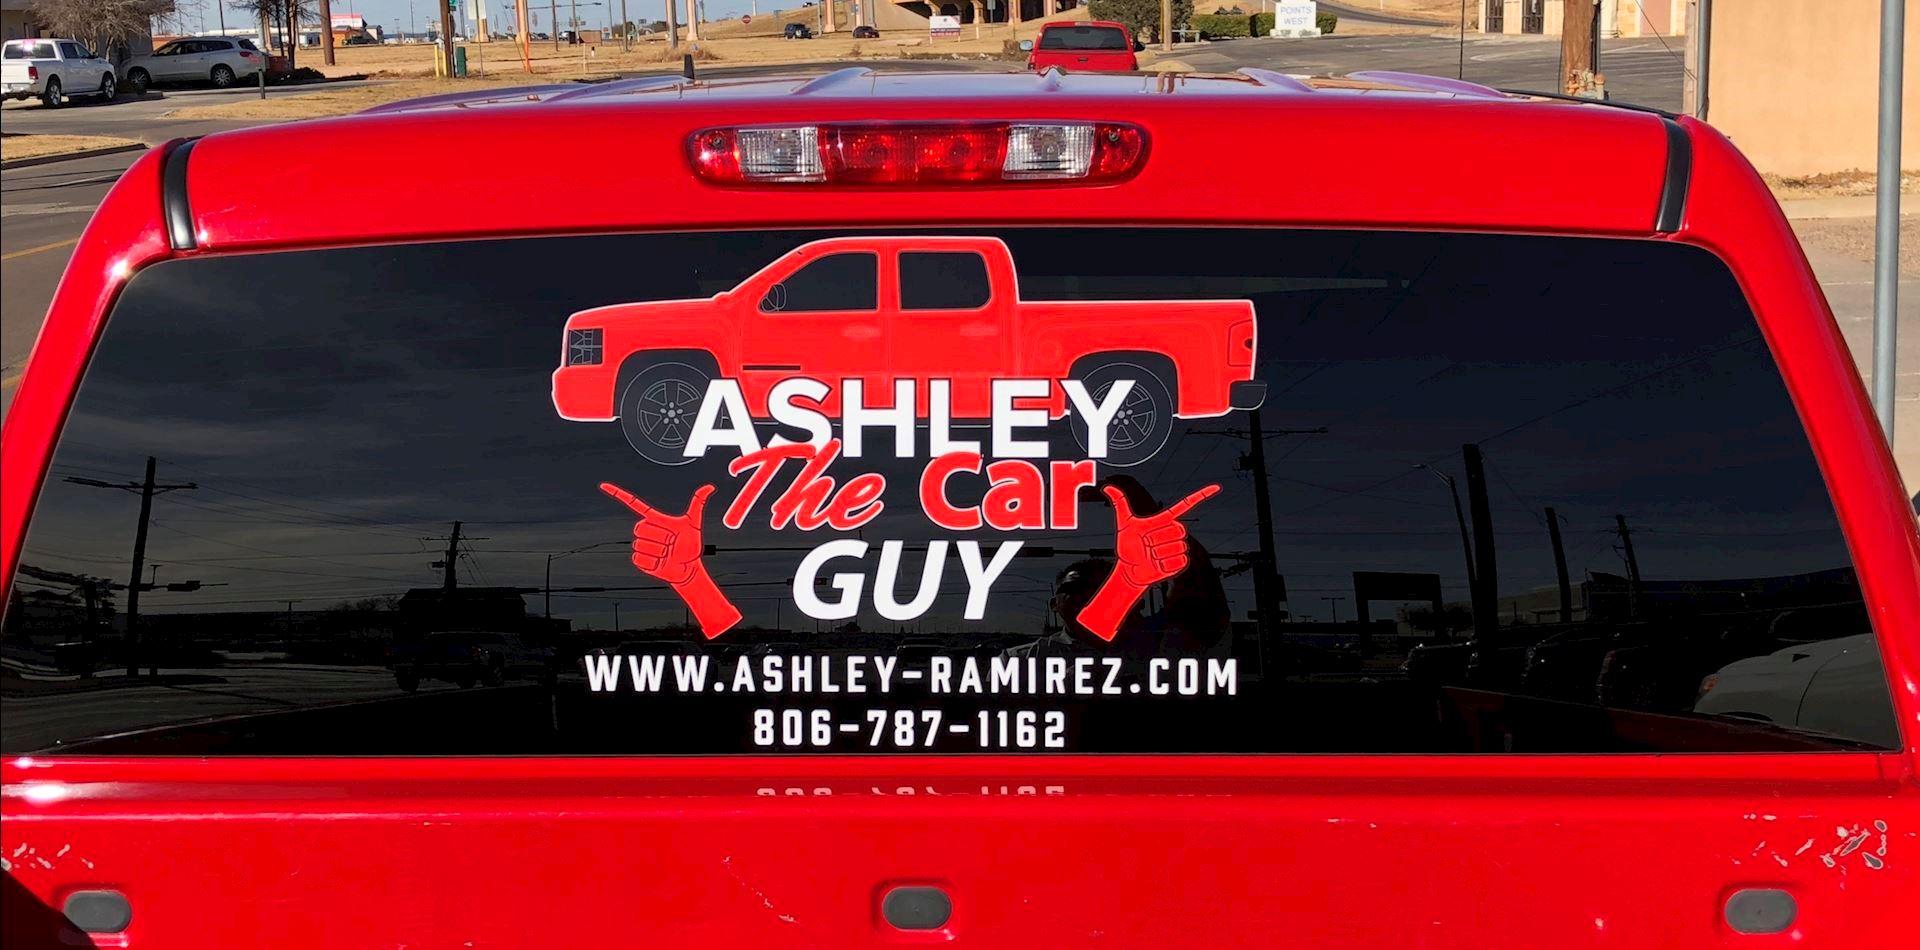 Pollard Used Cars >> Blog Ashley The Car Guy 7423 Ashley Ramirez Certified Used Cars